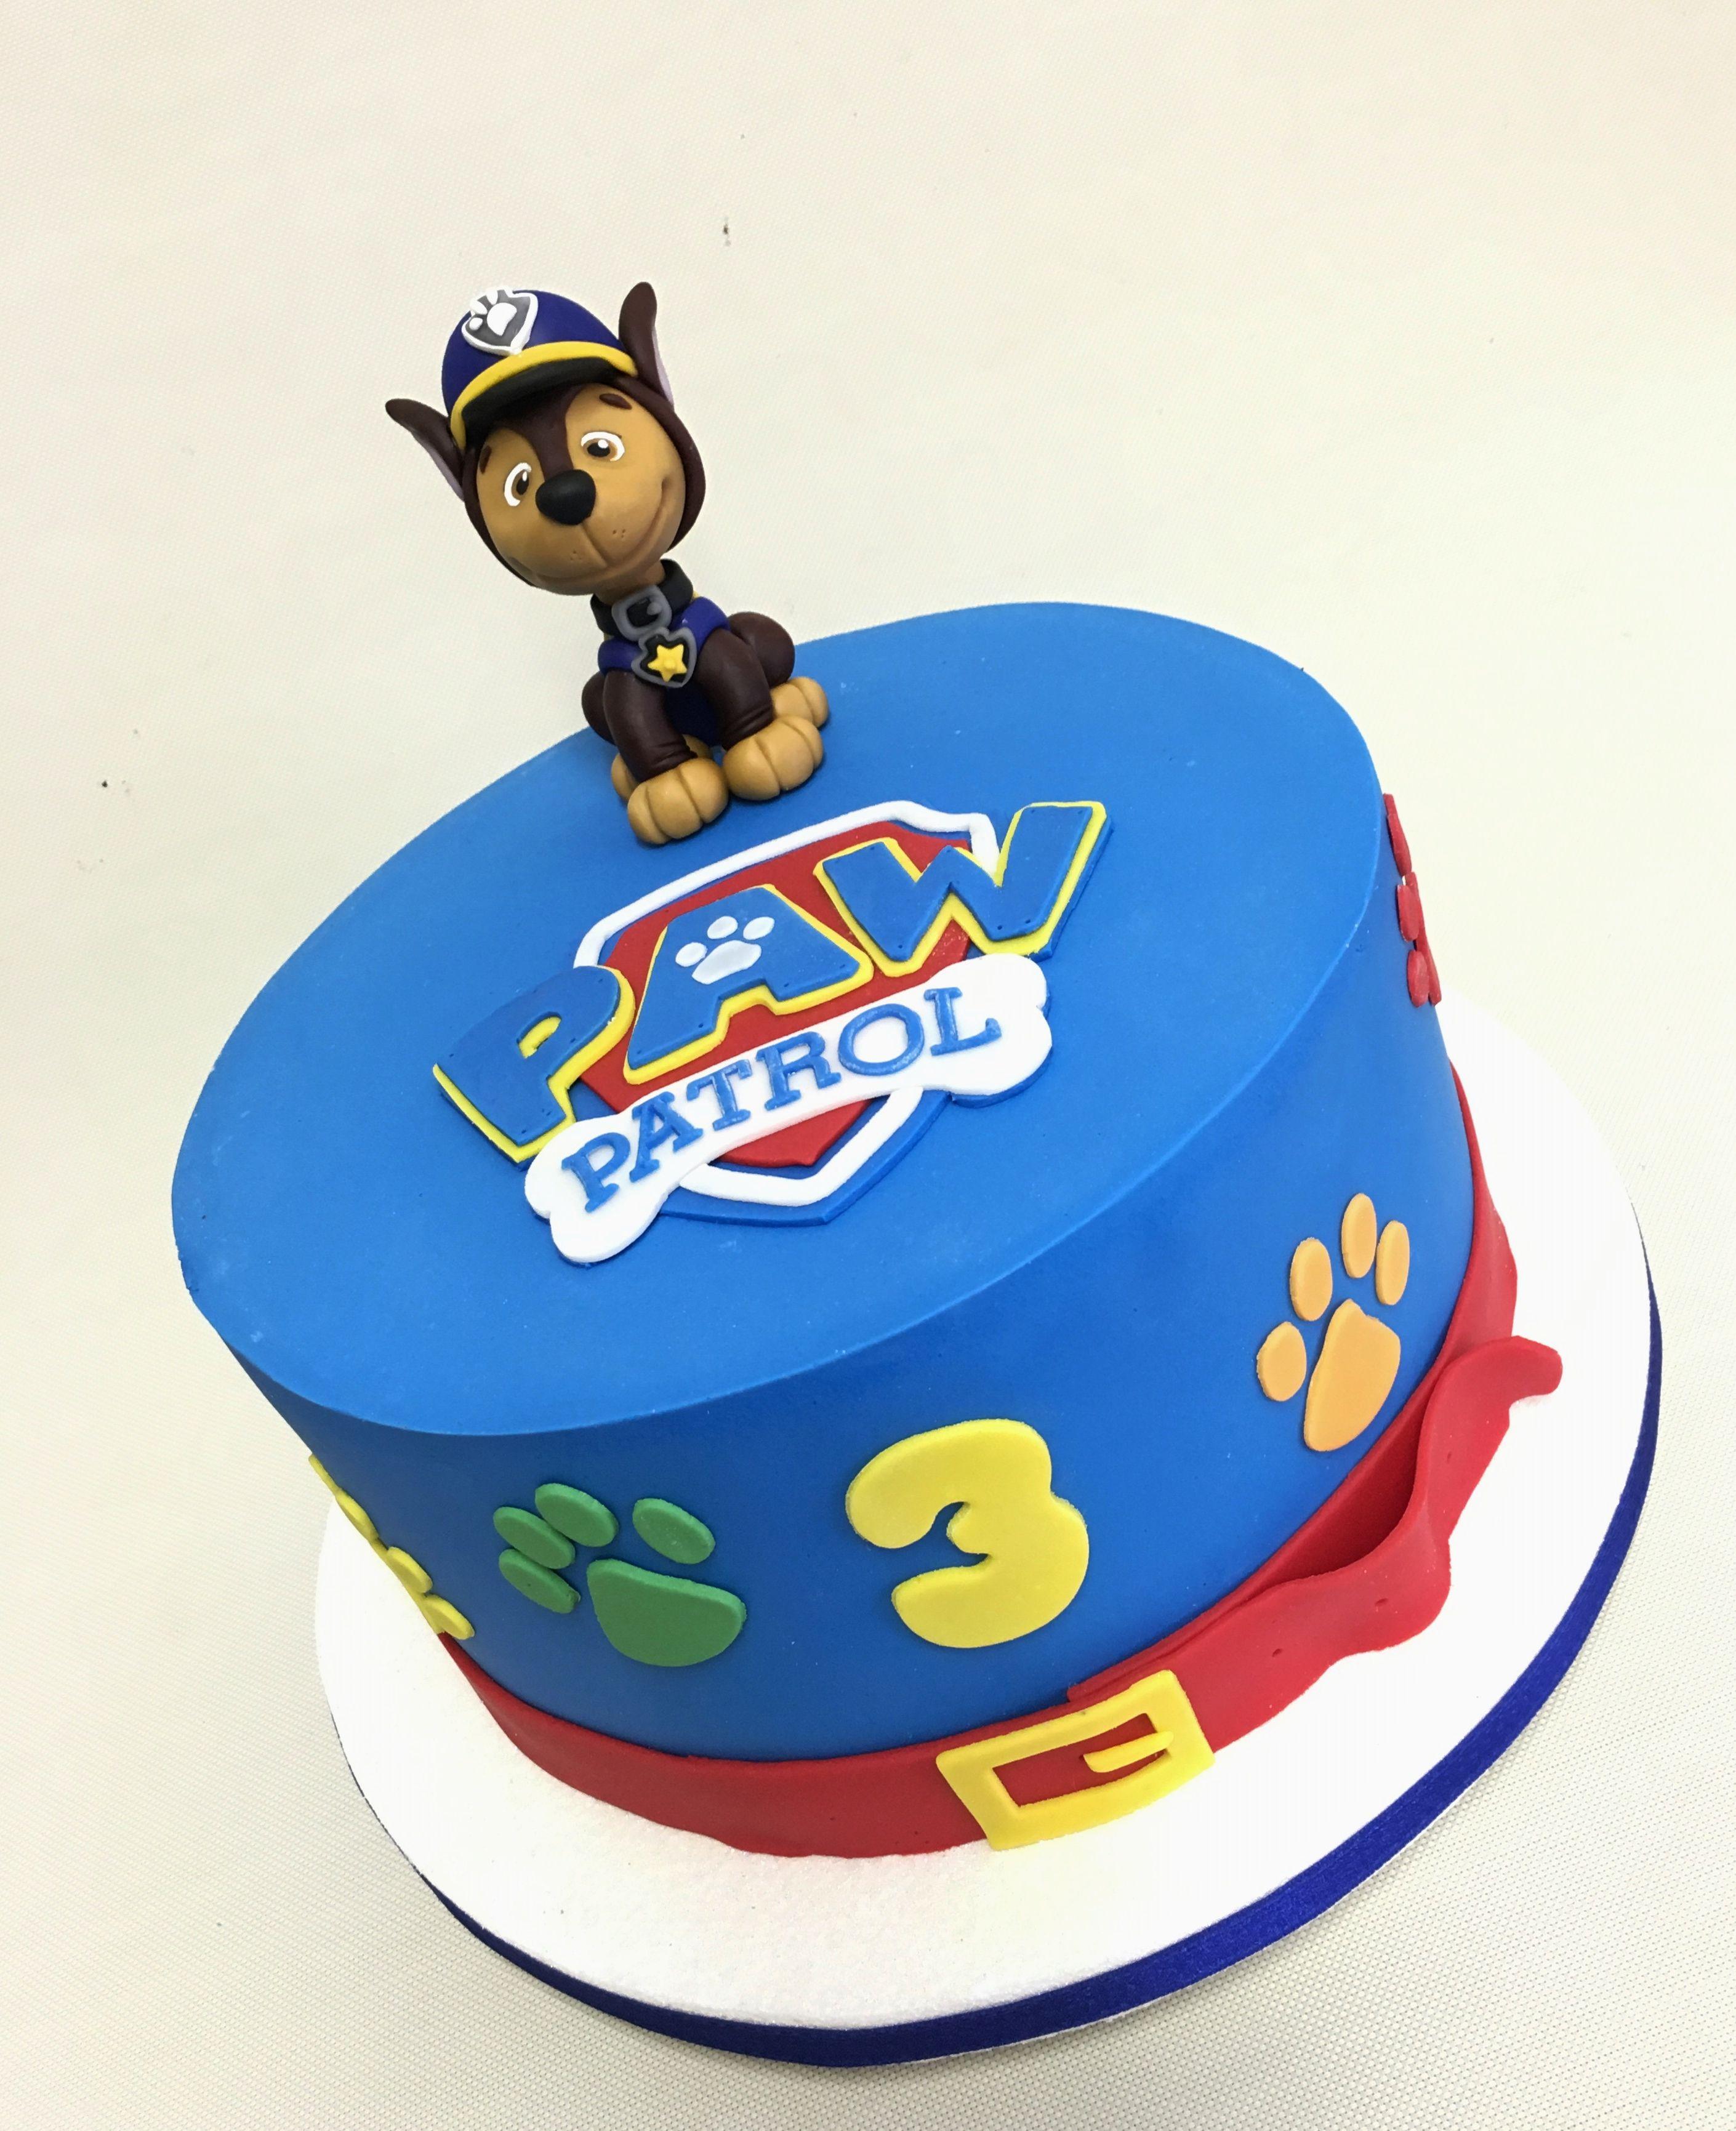 Paw Patrol Cake Chase Violeta Glace Birthdays Cakes En